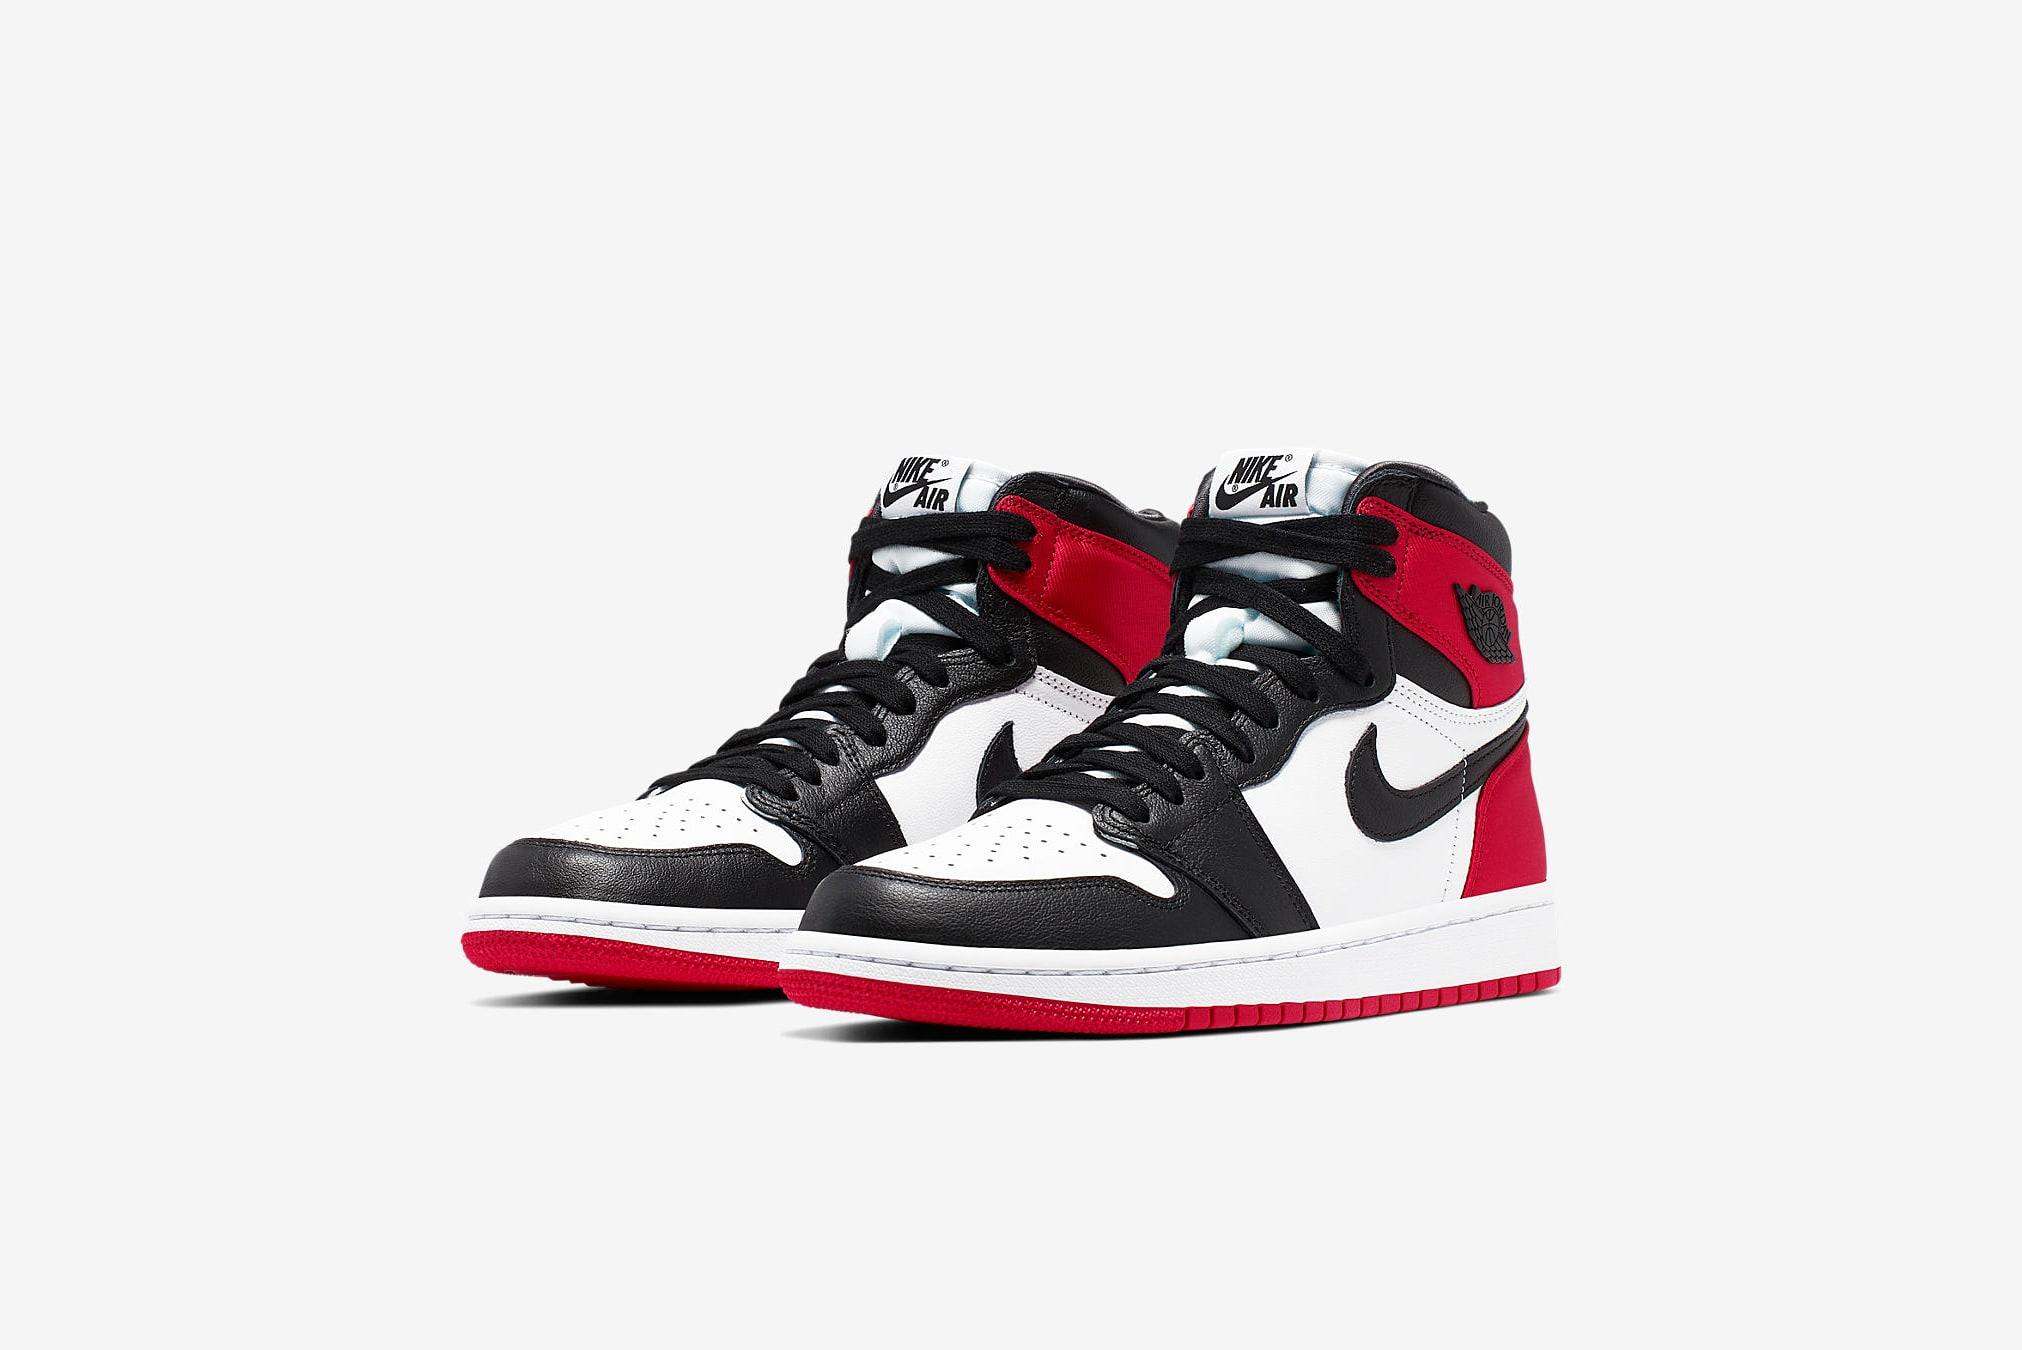 Nike Air Jordan 1 Retro High OG W - CD0461-016